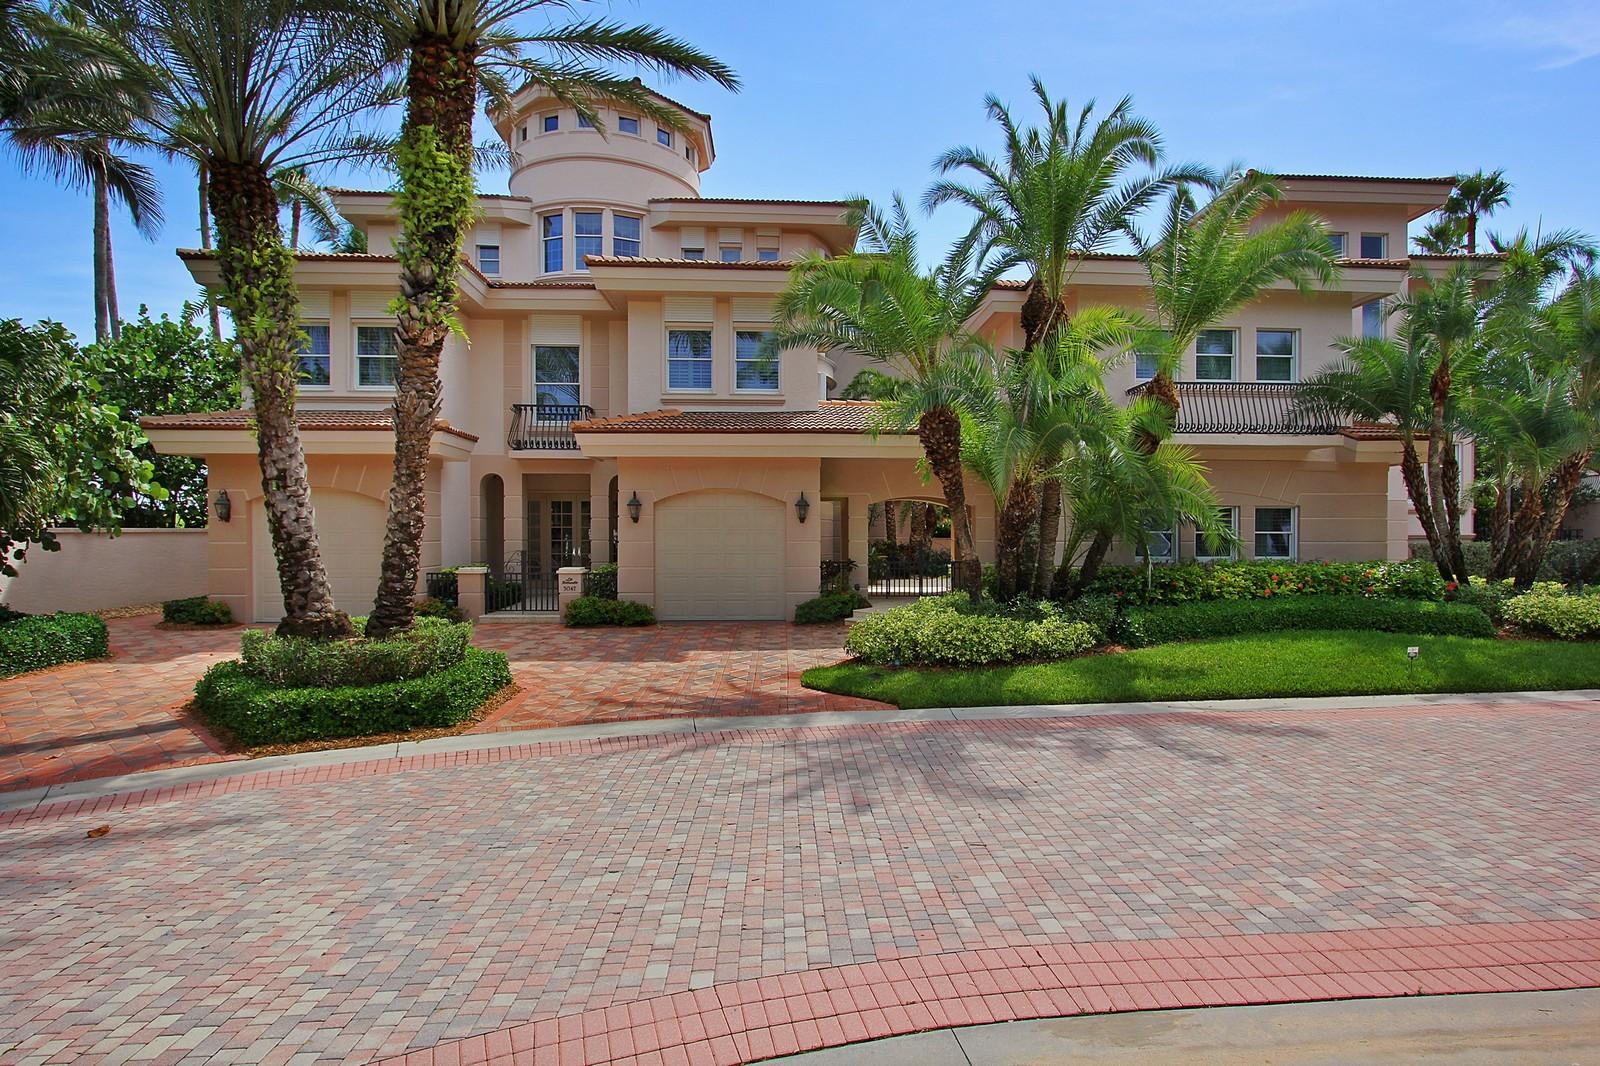 Real Estate Photography - 3047 SE Island Point Lane, Stuart, FL, 34996 - Front View